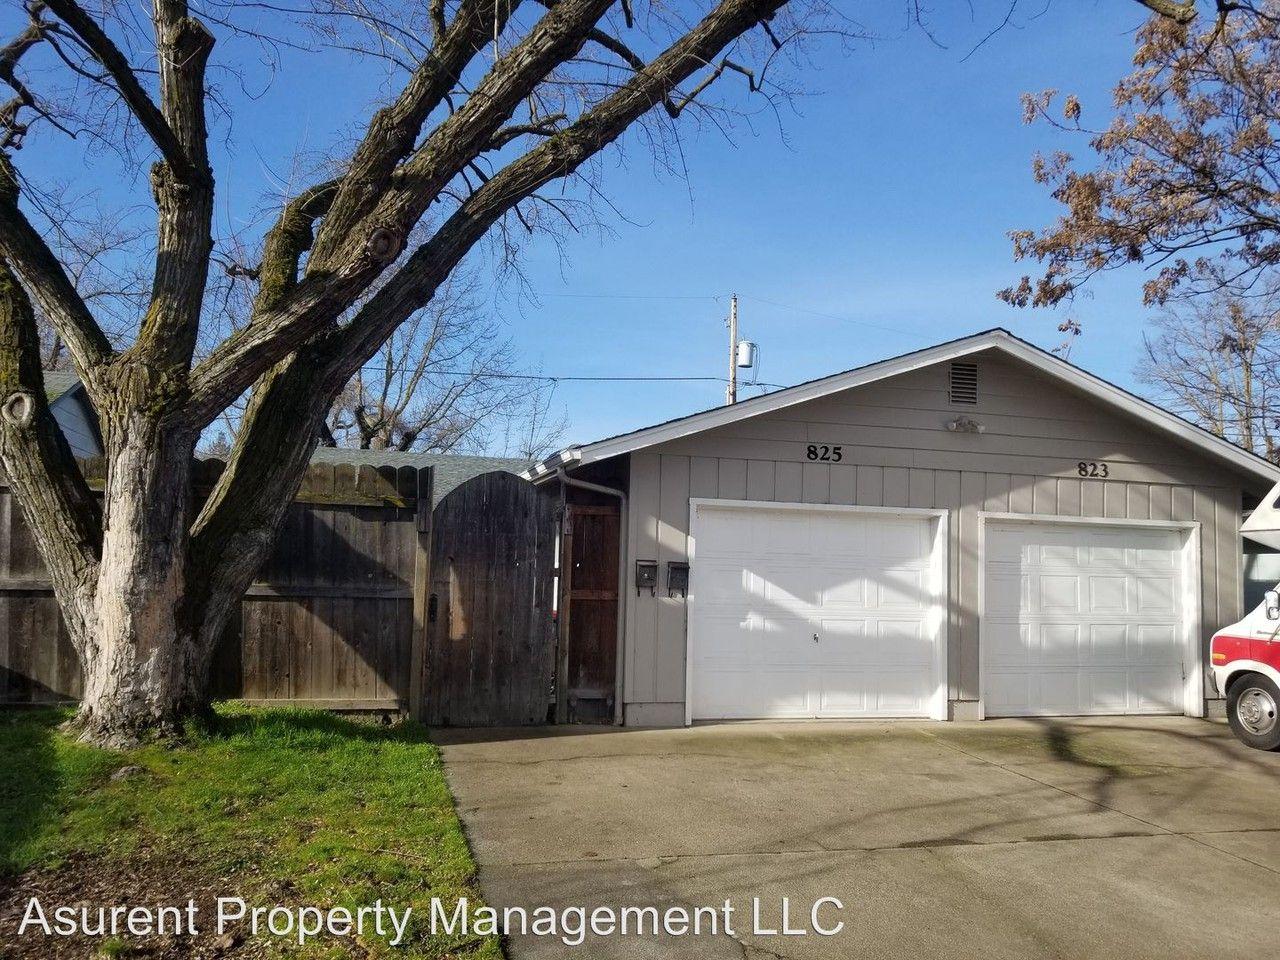 823 Oak St, Medford, OR 97501 2 Bedroom House for Rent for ...